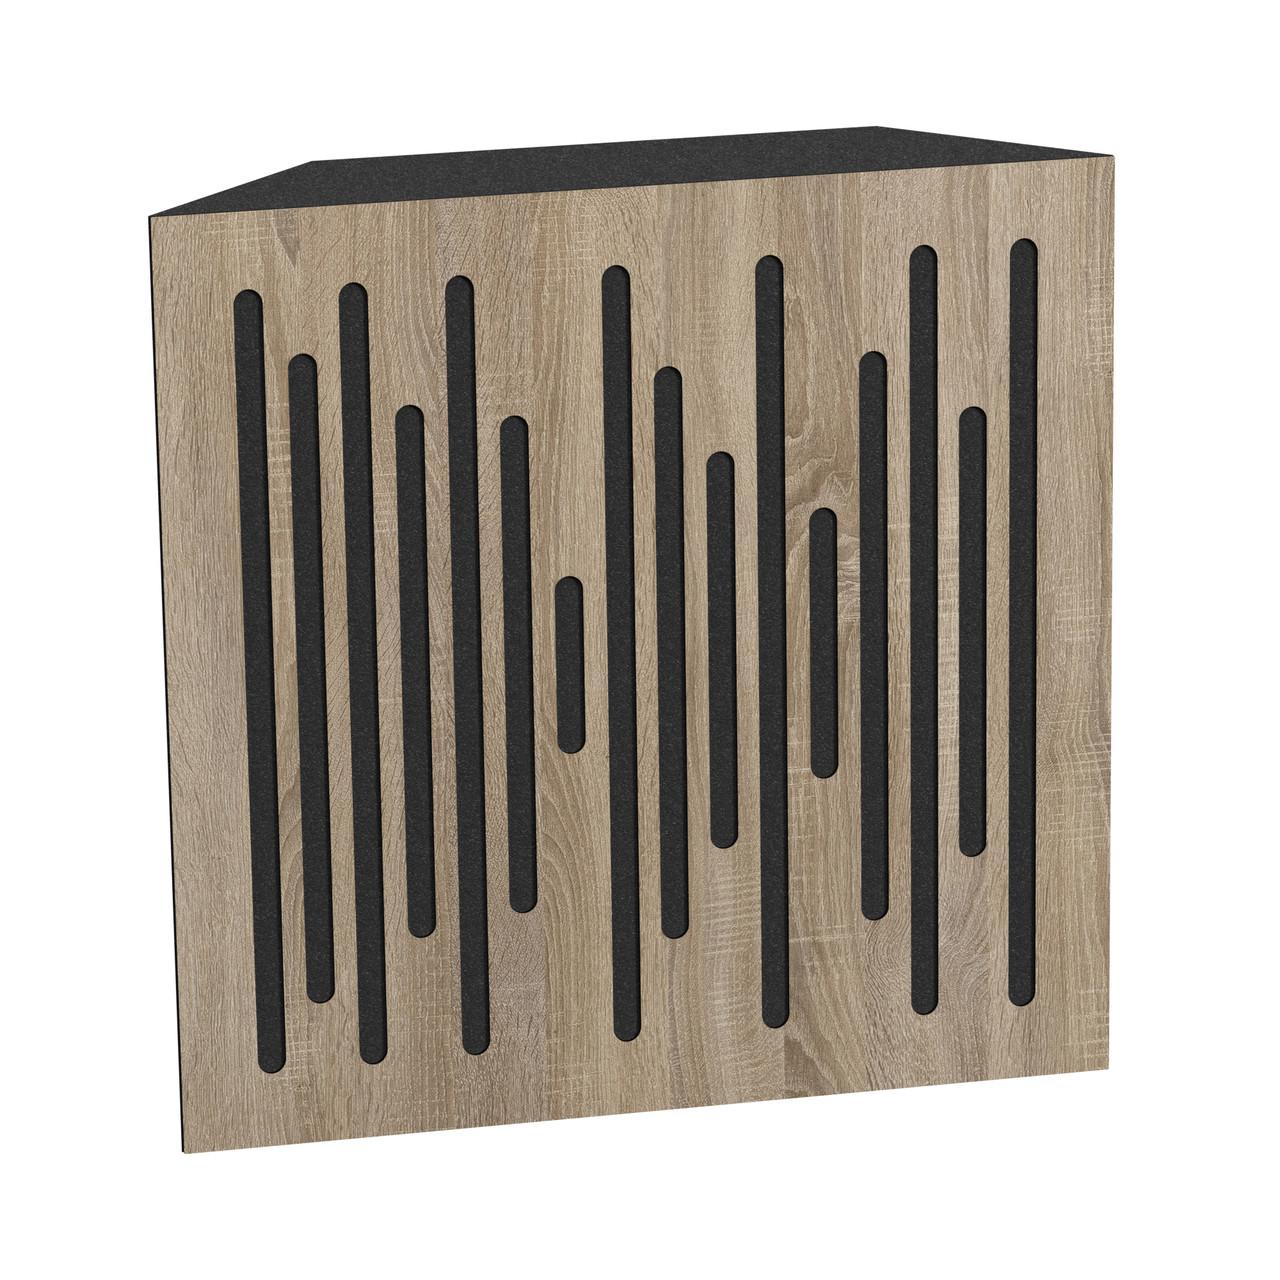 Бас пастка Ecosound Bass trap Ecowave wood 500х500х100 колір сонома